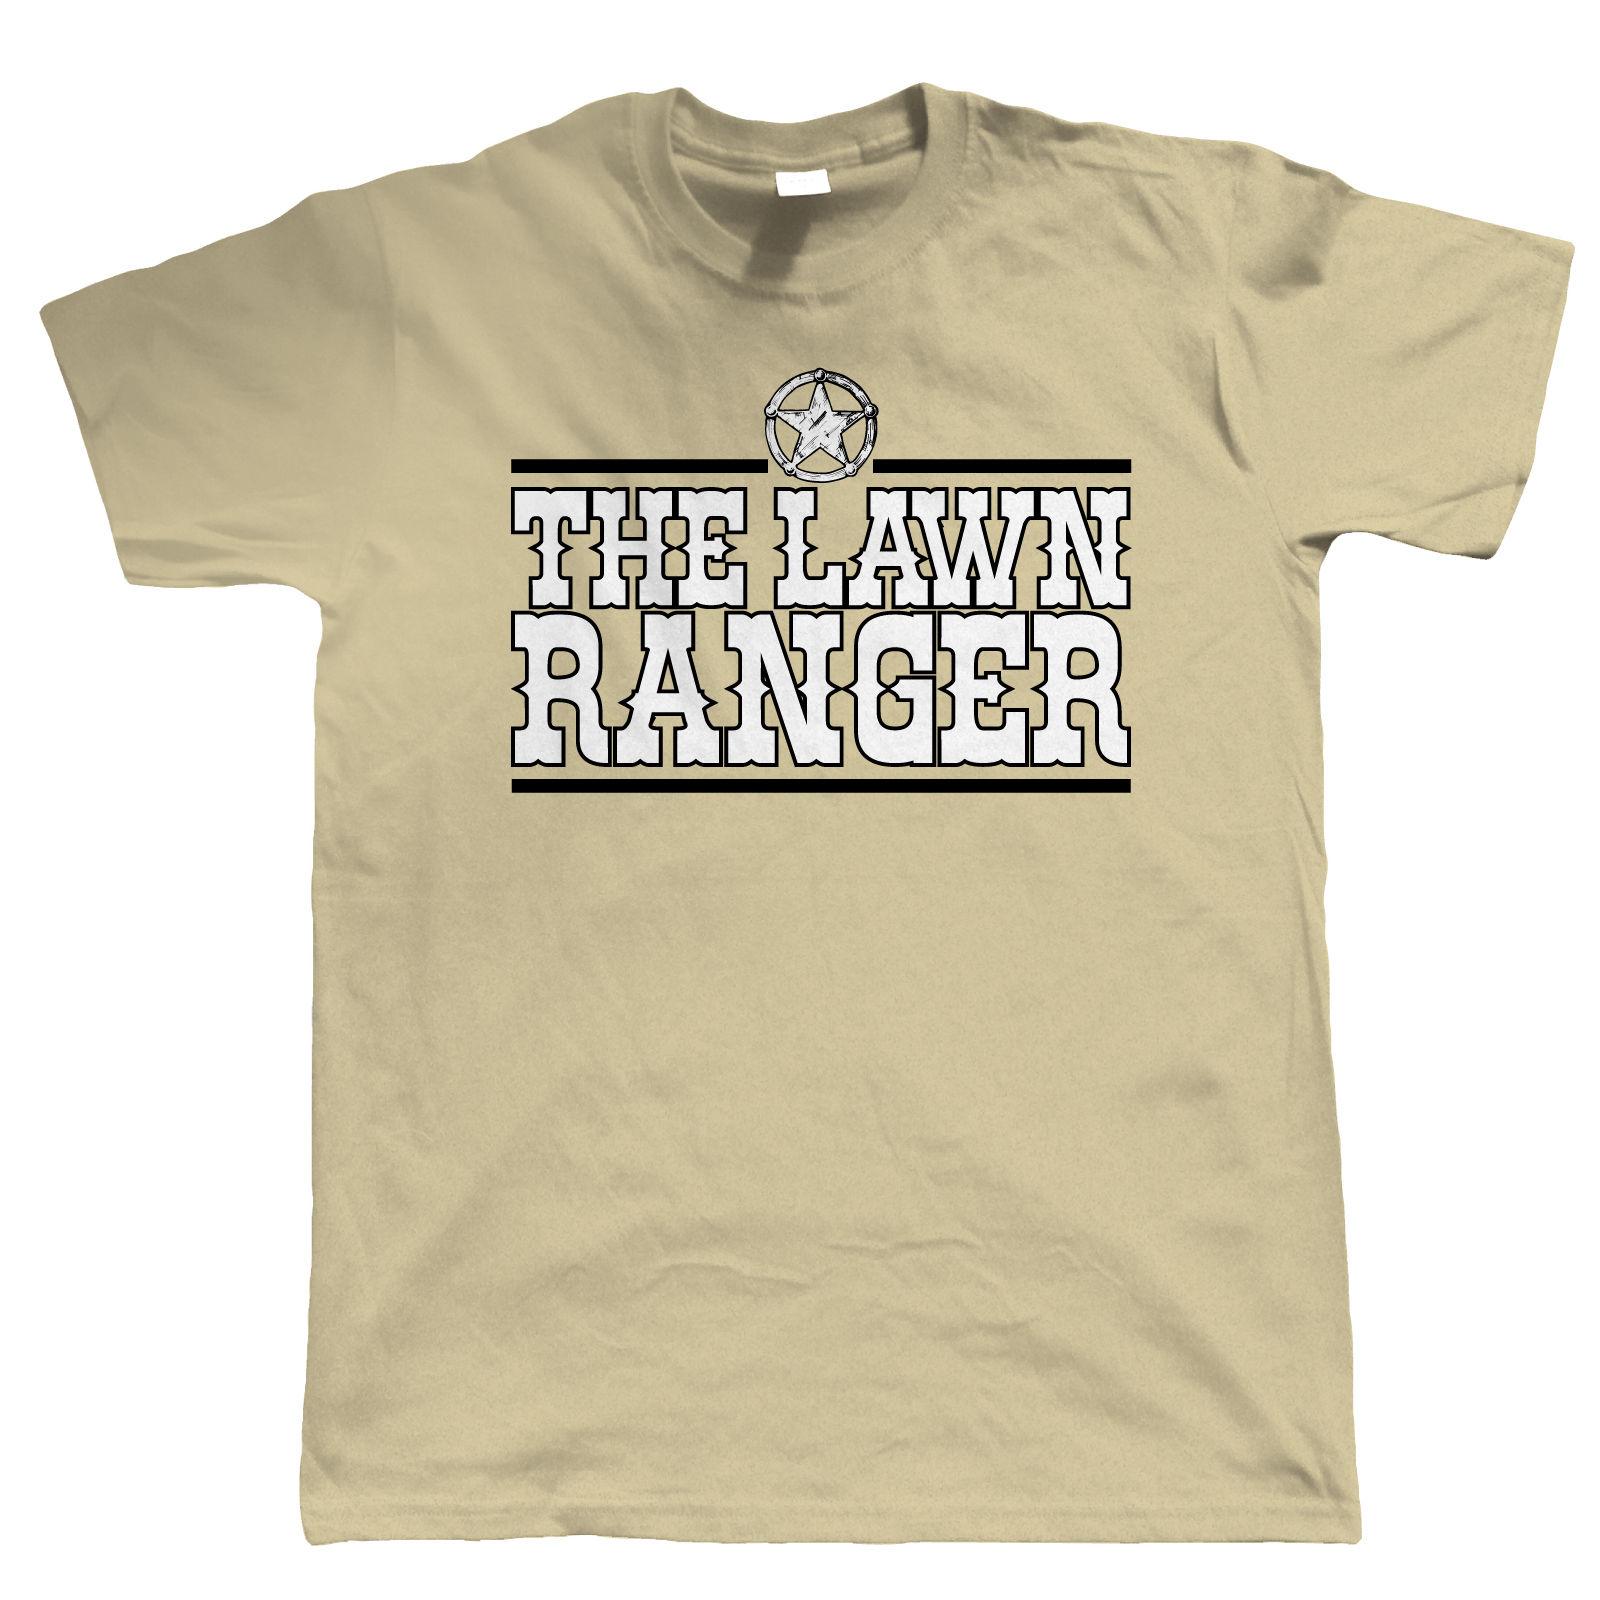 The lawn ranger mens funny gardening t shirt gift for for Gardening gifts for men